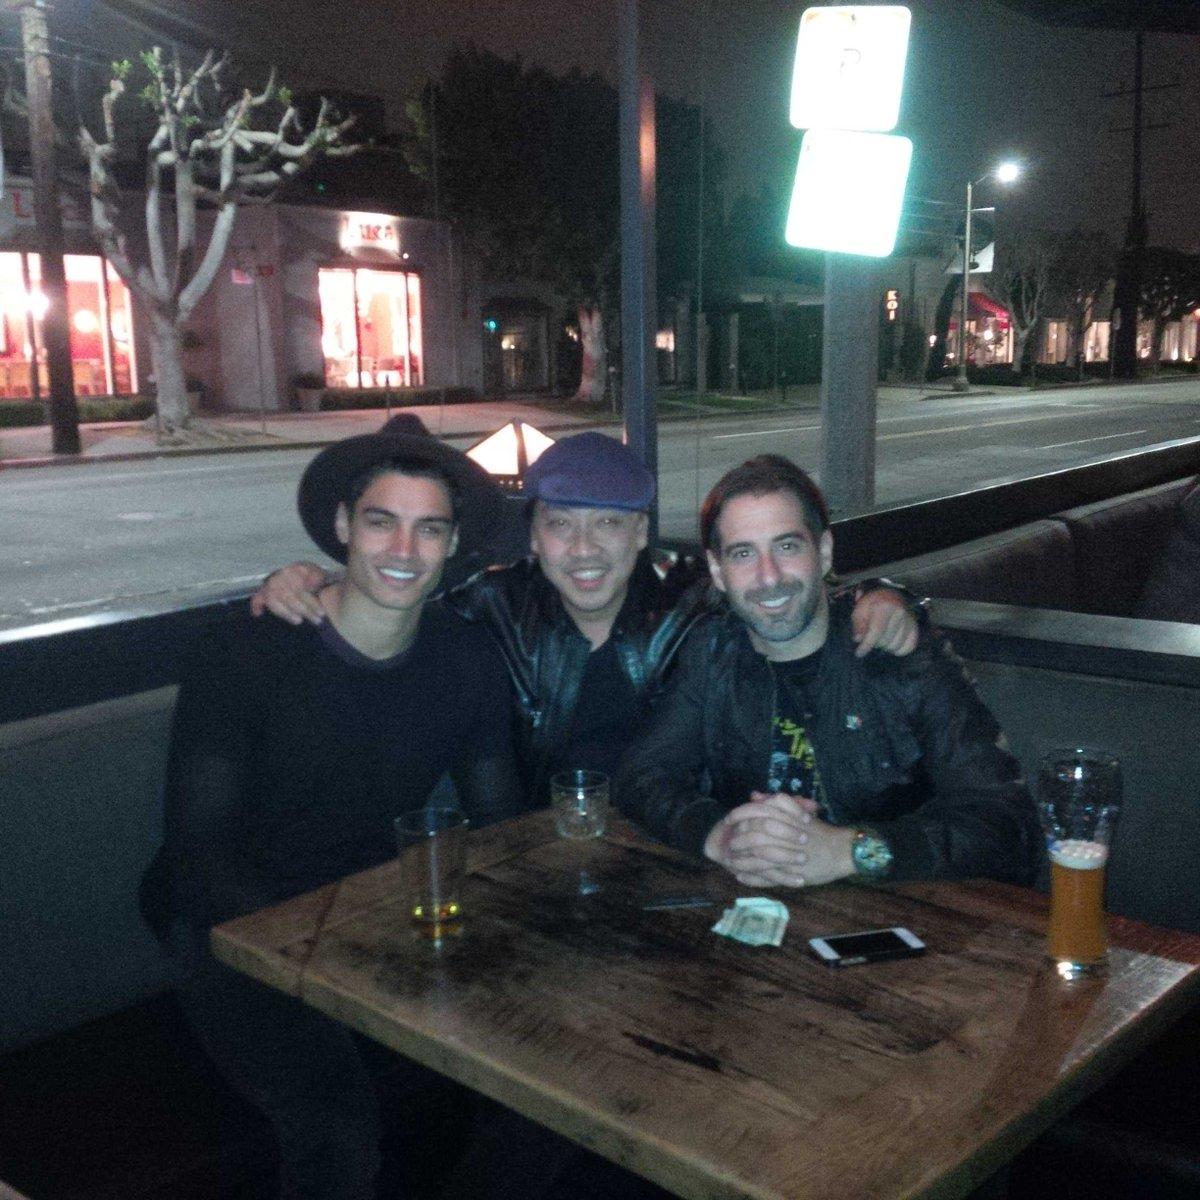 A little celebration with my dawgs @elmolovano and @SivaKaneswaran!! #notdrunk http://t.co/fsRxfBiFpn